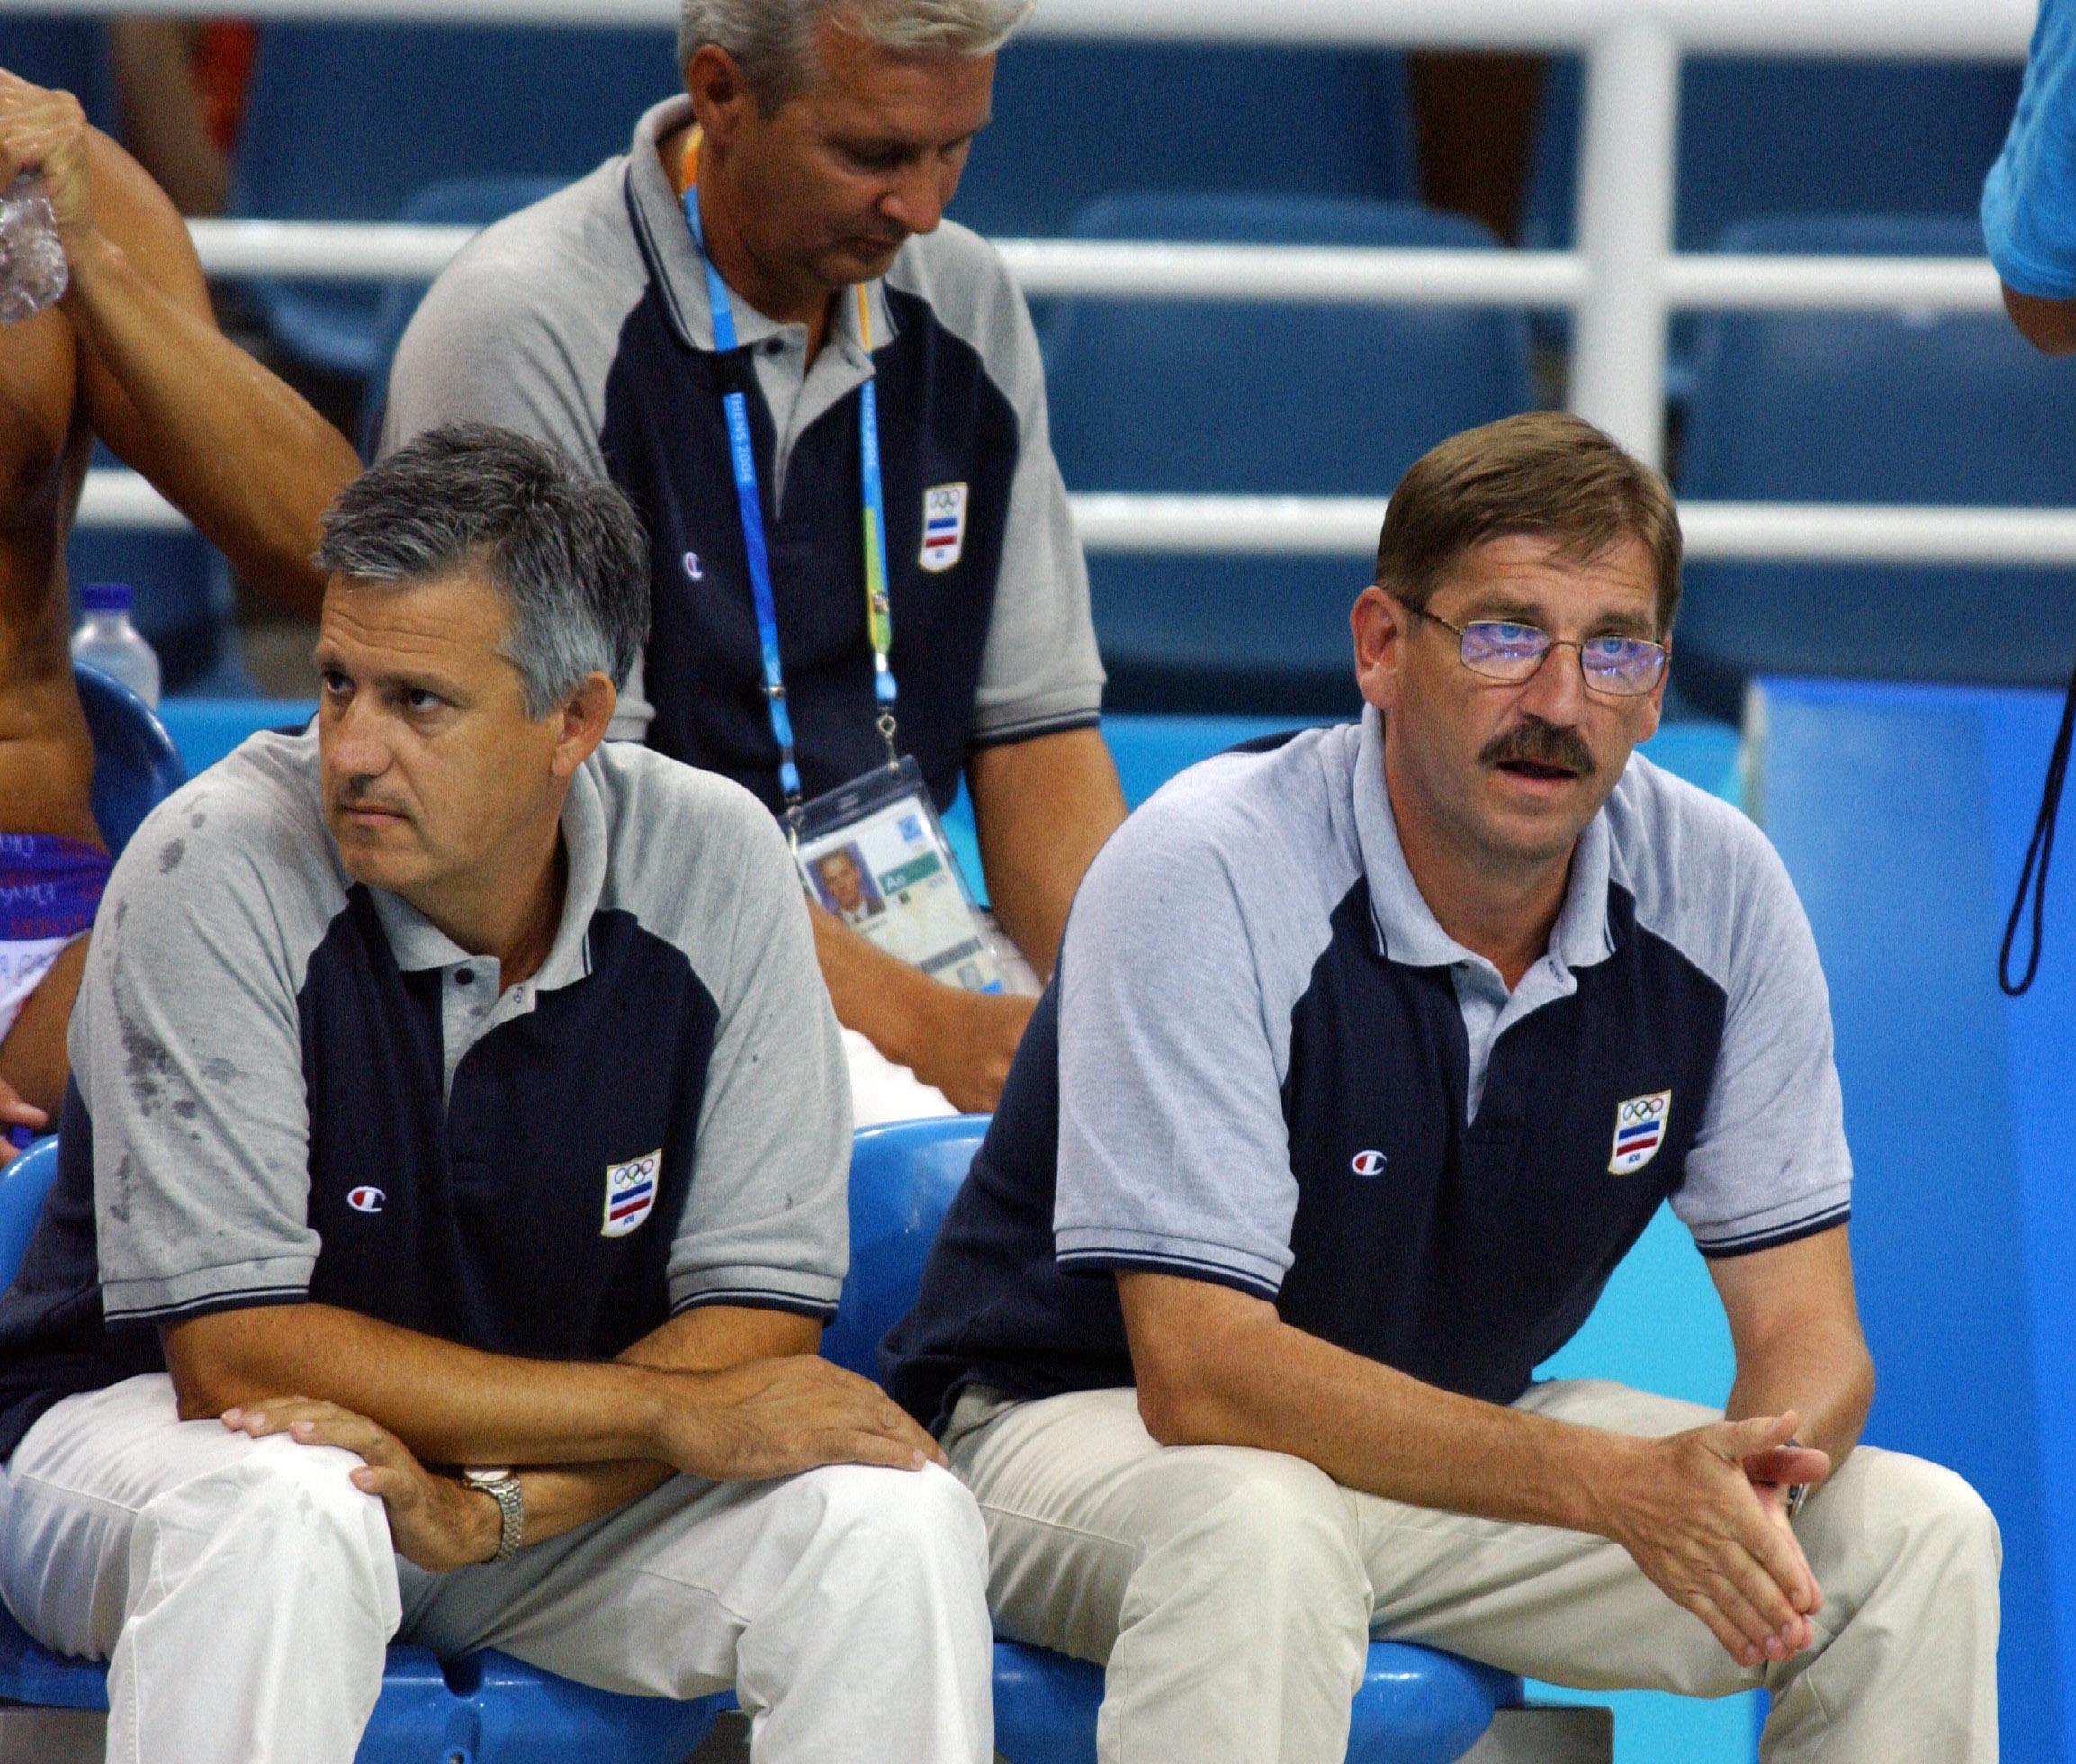 2004. (21.08.) OI ATINA - Petar Porobic i Nenad Manojlovic, treneri SiCG, na utakmici protiv Hrvatske